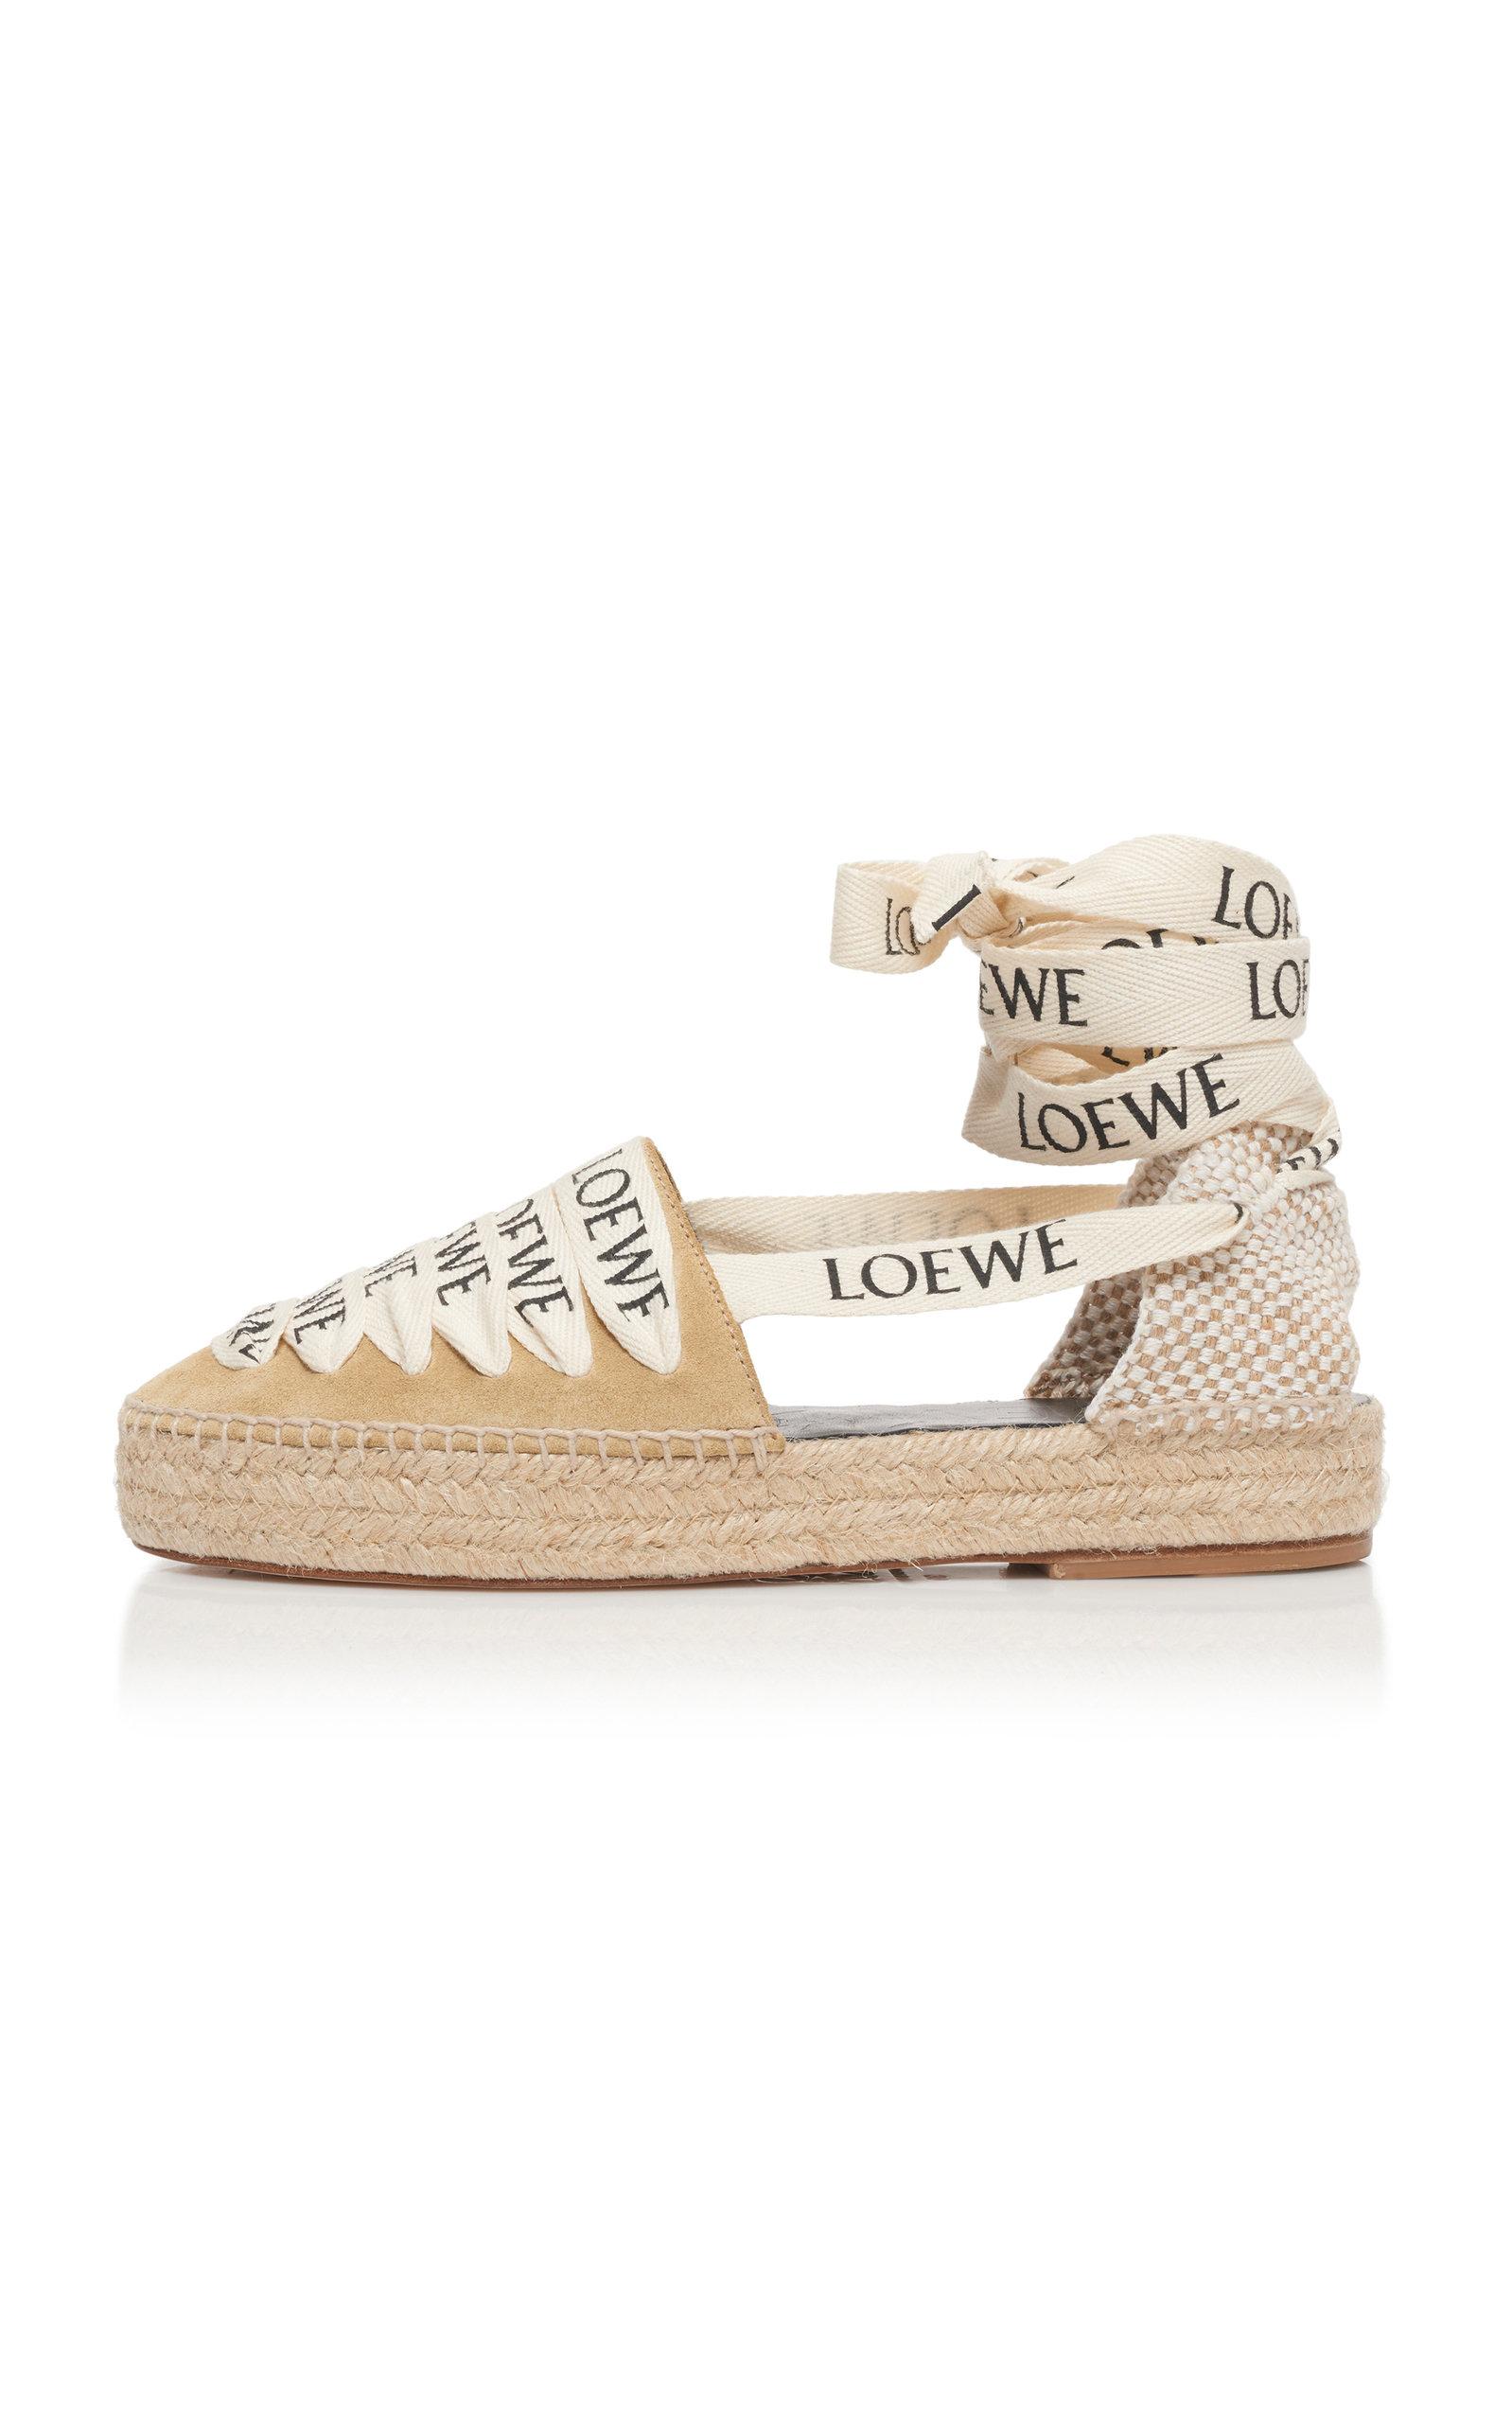 Loewe Shoes Suede Platform Espadrille Sandals